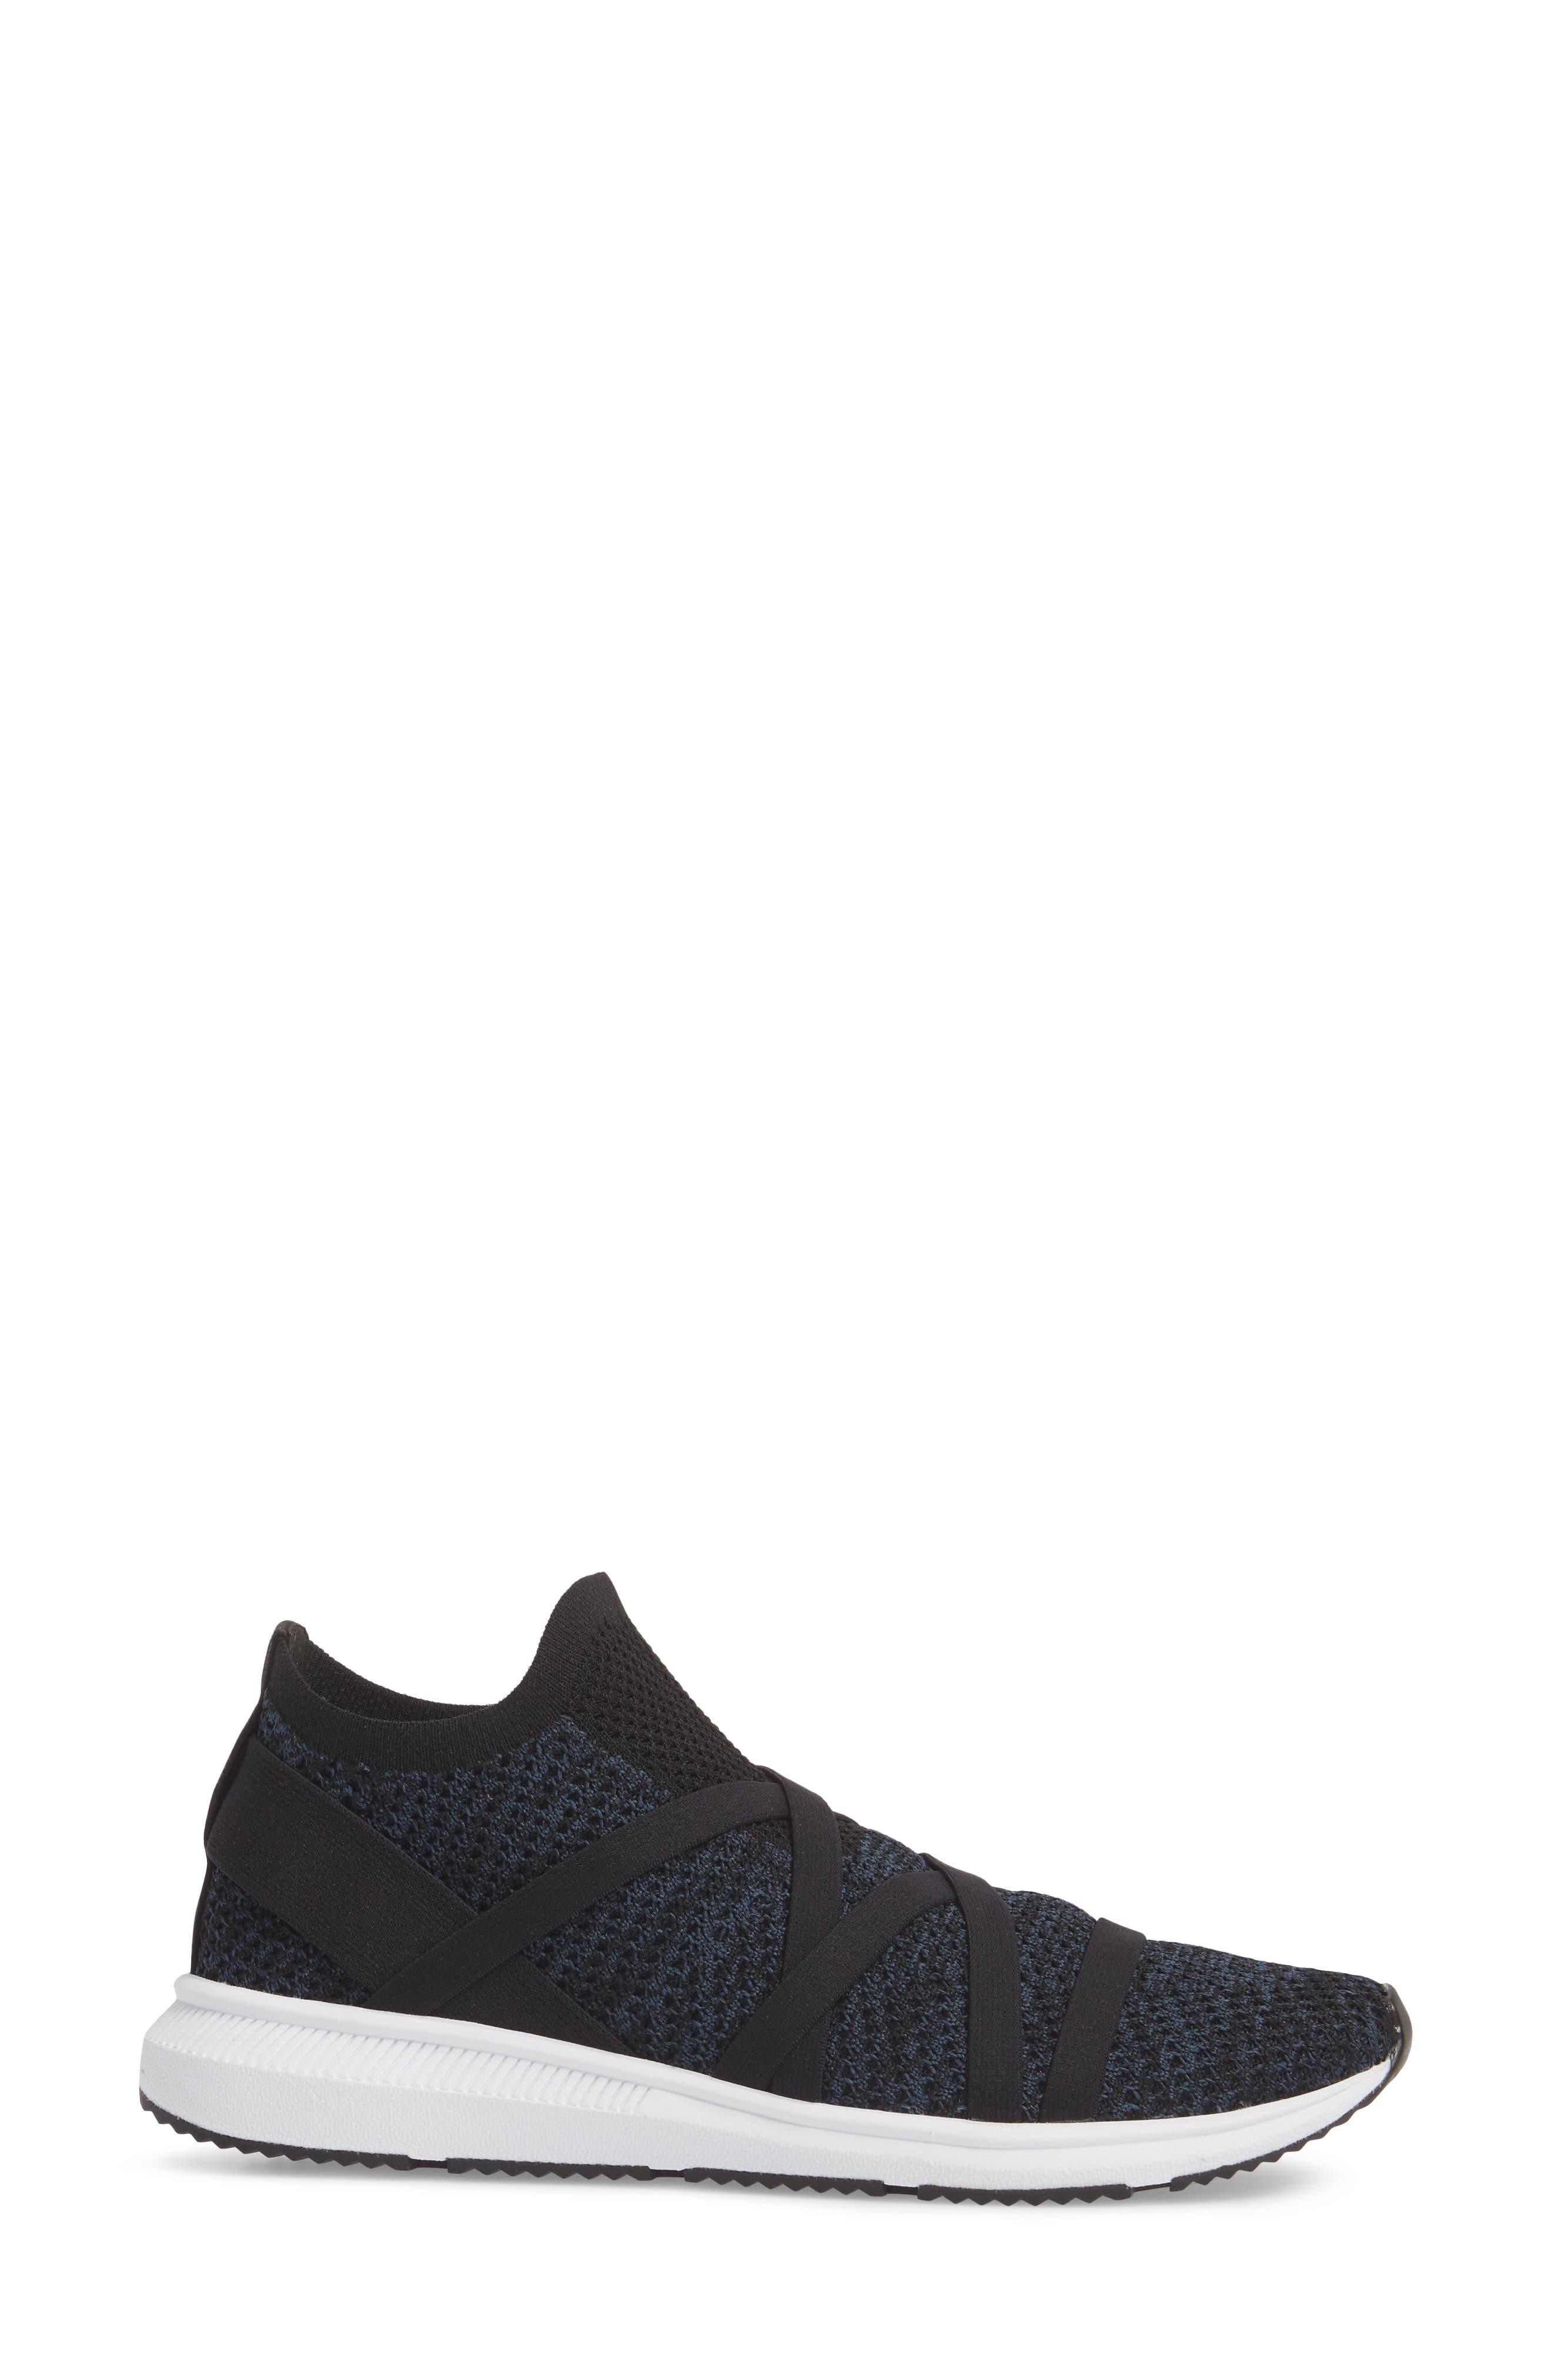 Xanady Woven Slip-On Sneaker,                             Alternate thumbnail 3, color,                             Black/ Marine Stretch